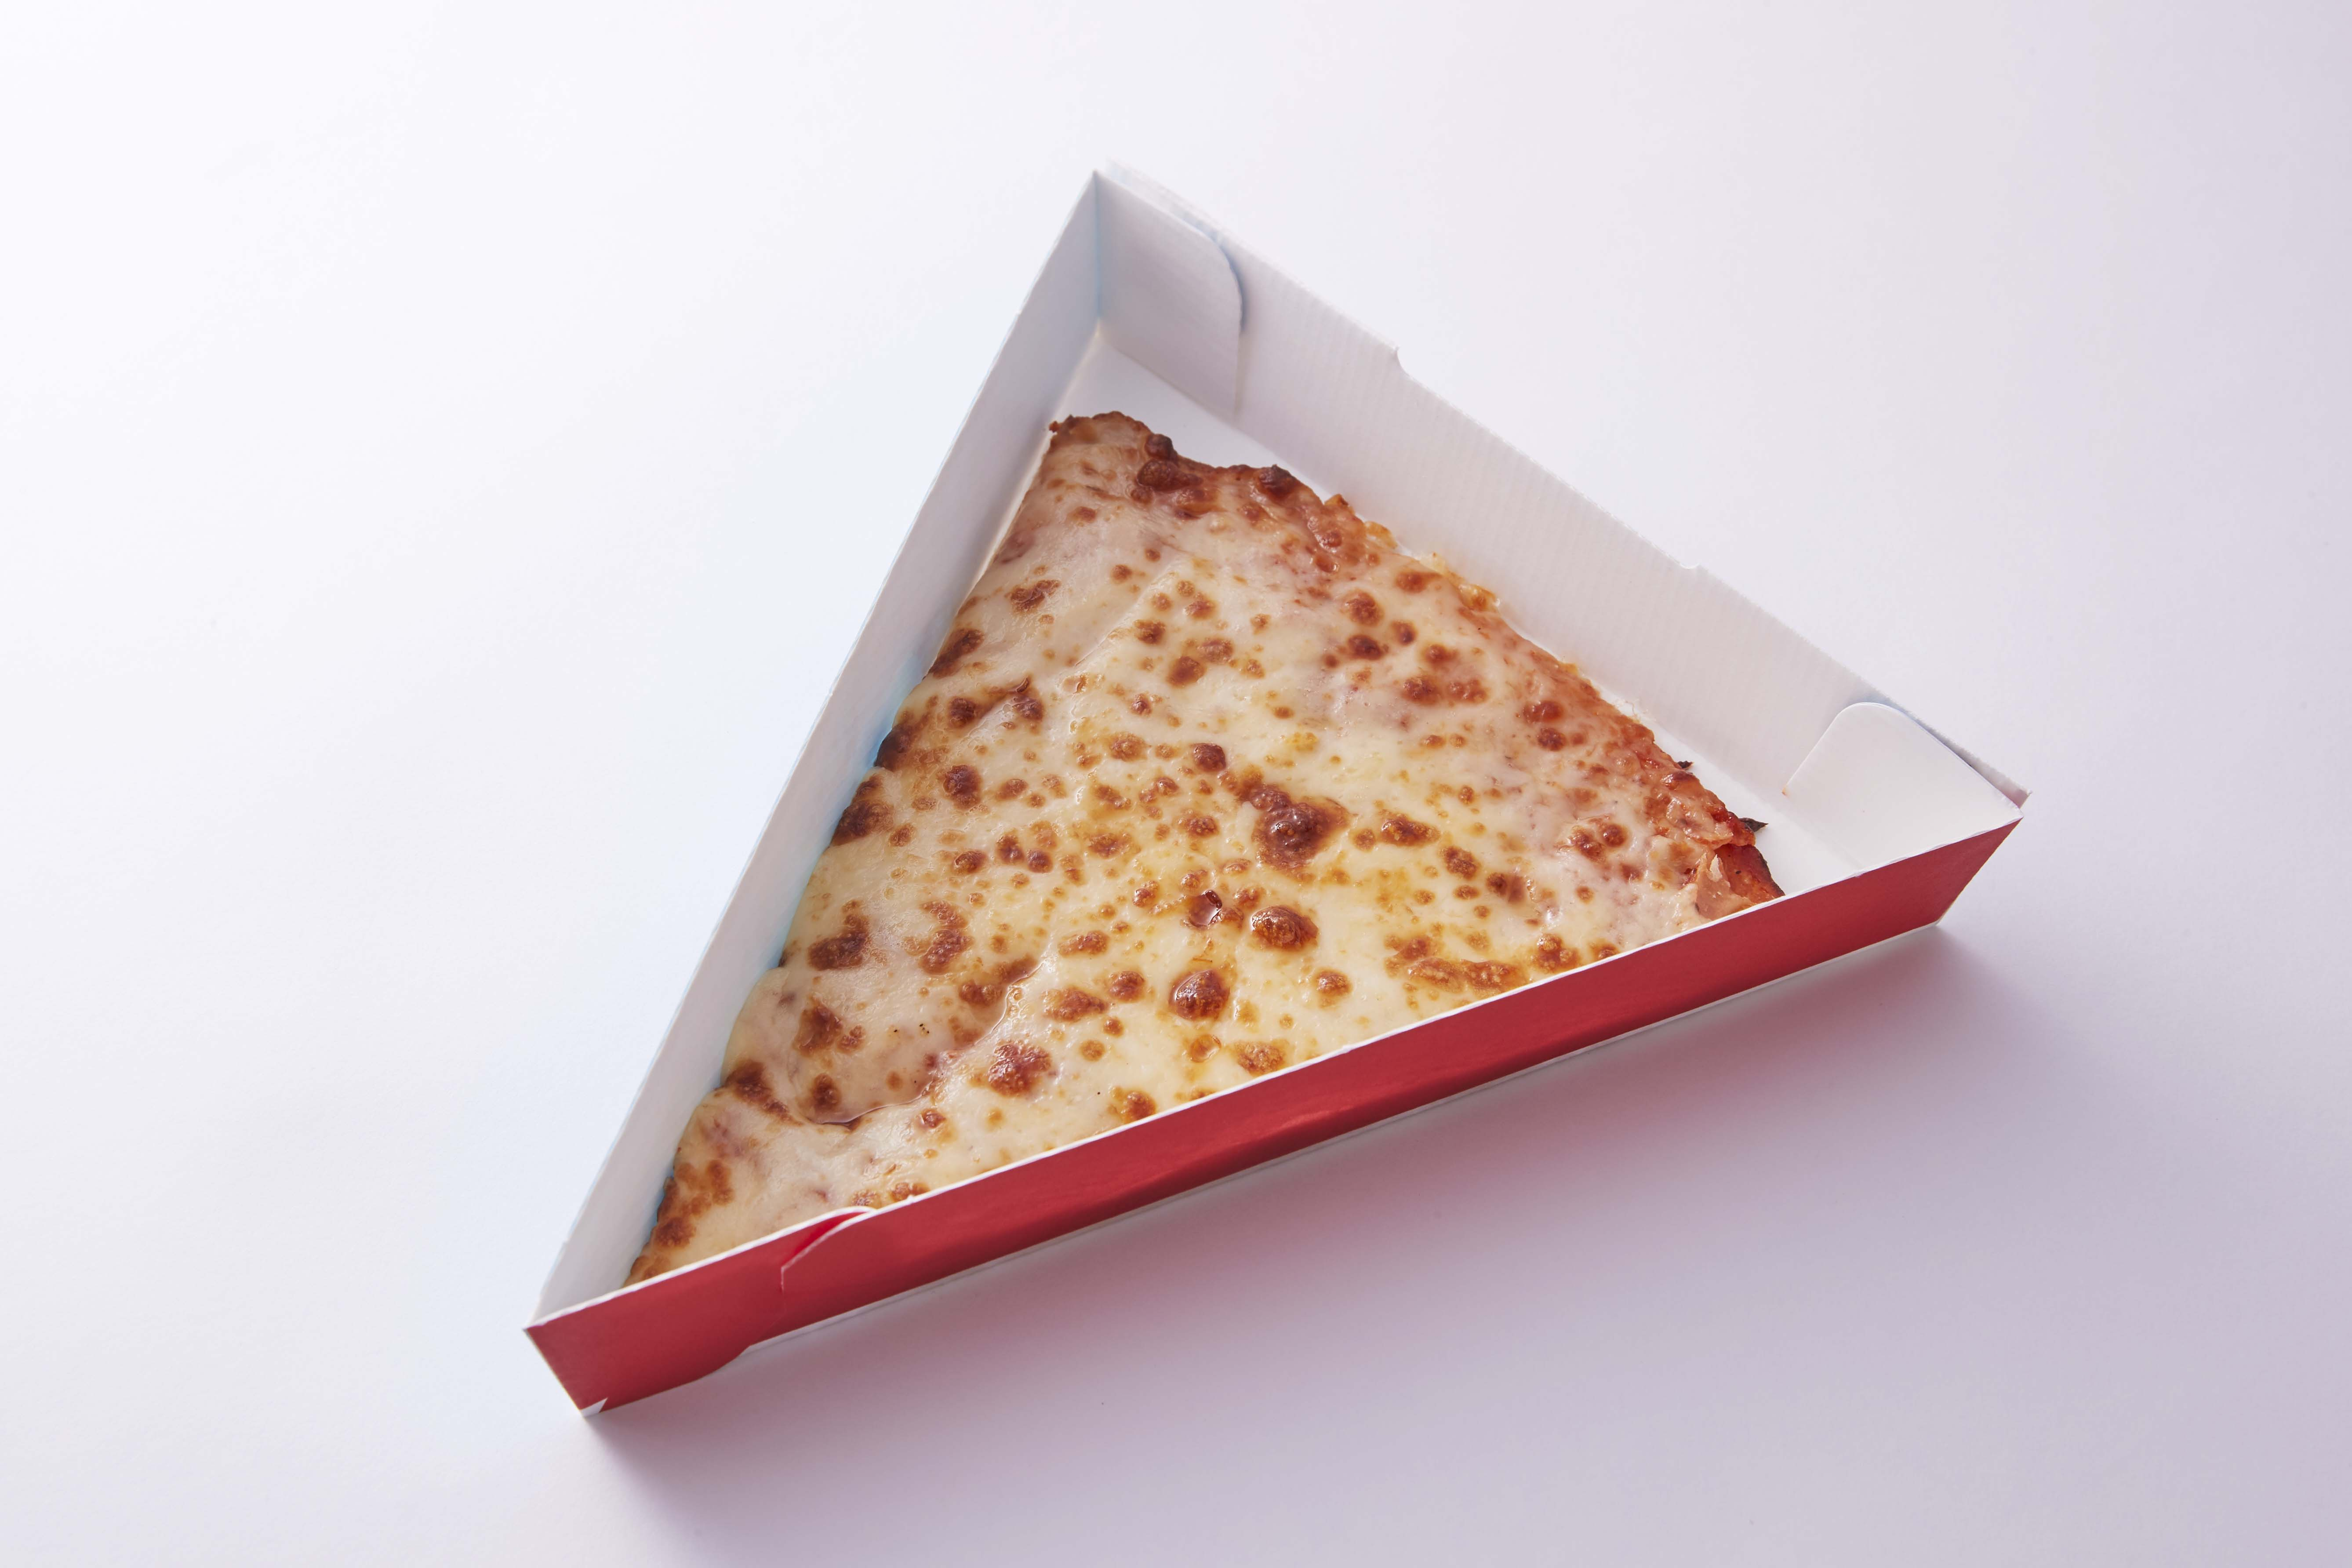 Foods & Shop - Item - 倍盛り!チーズピザ